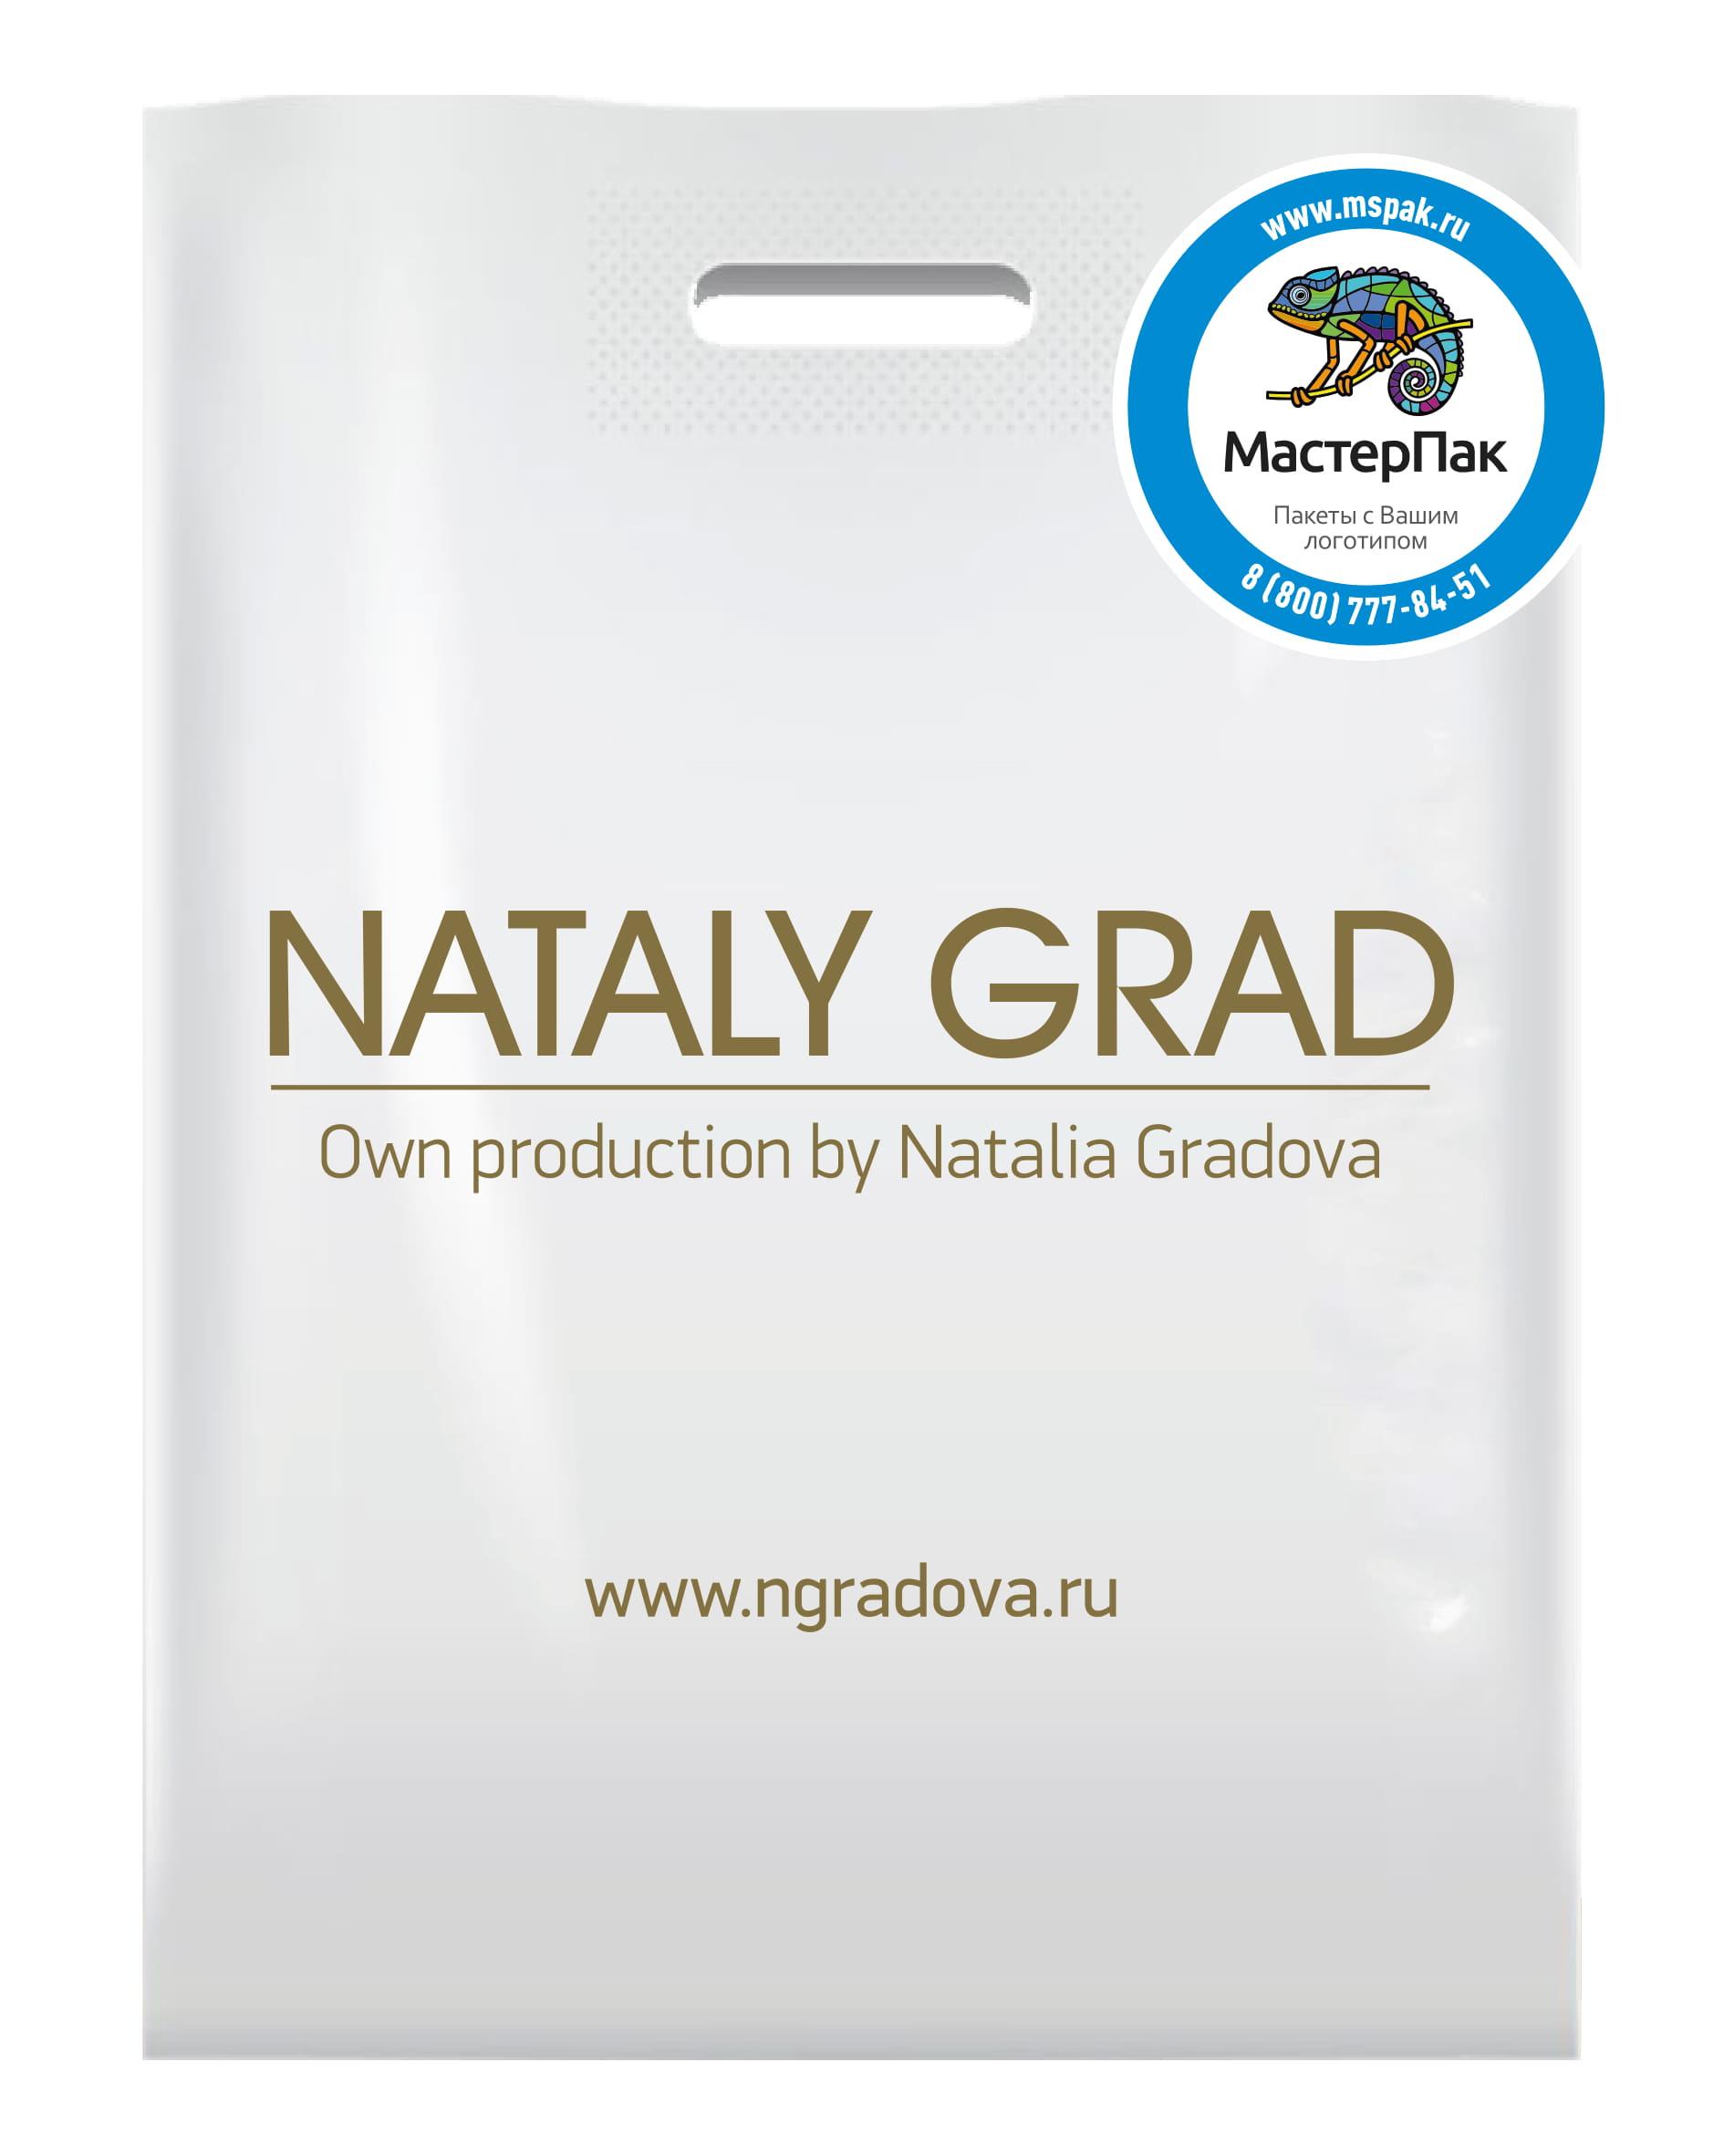 Пакет ПВД с логотипом Nataly Grad, Ростов-на-Дону, 70 мкм, 30*40